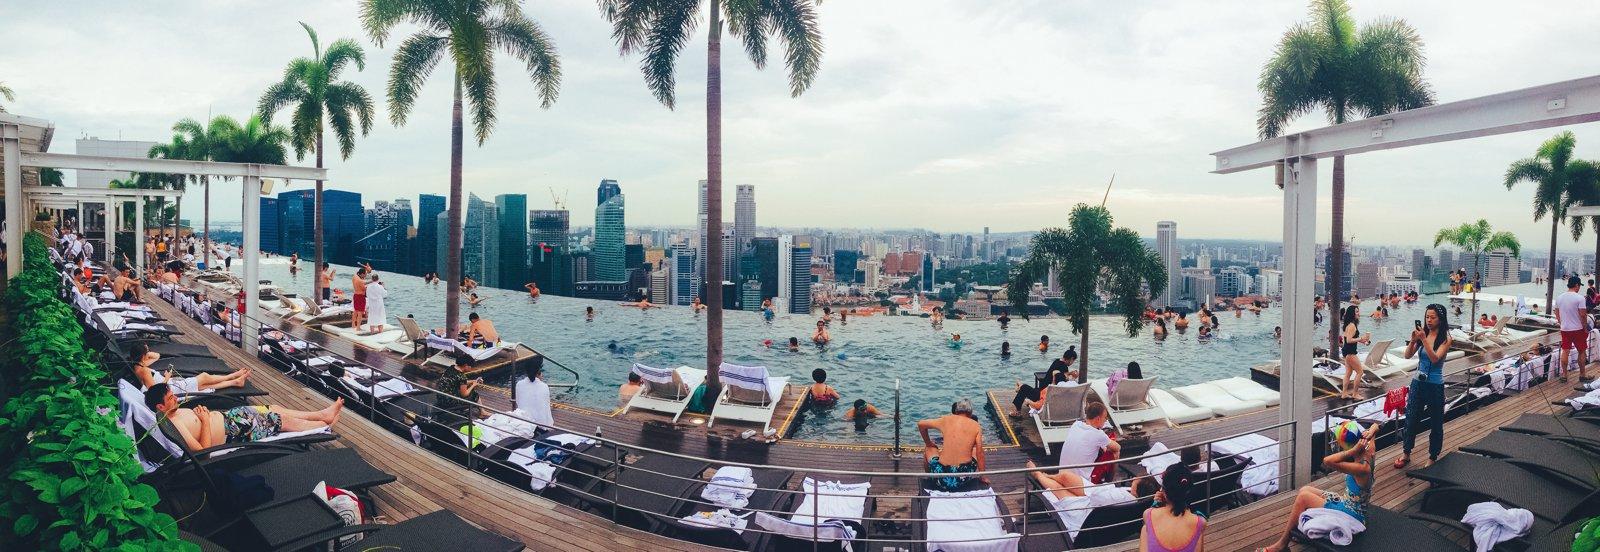 11 Dramatic Panoramic Travel Photos! (8)